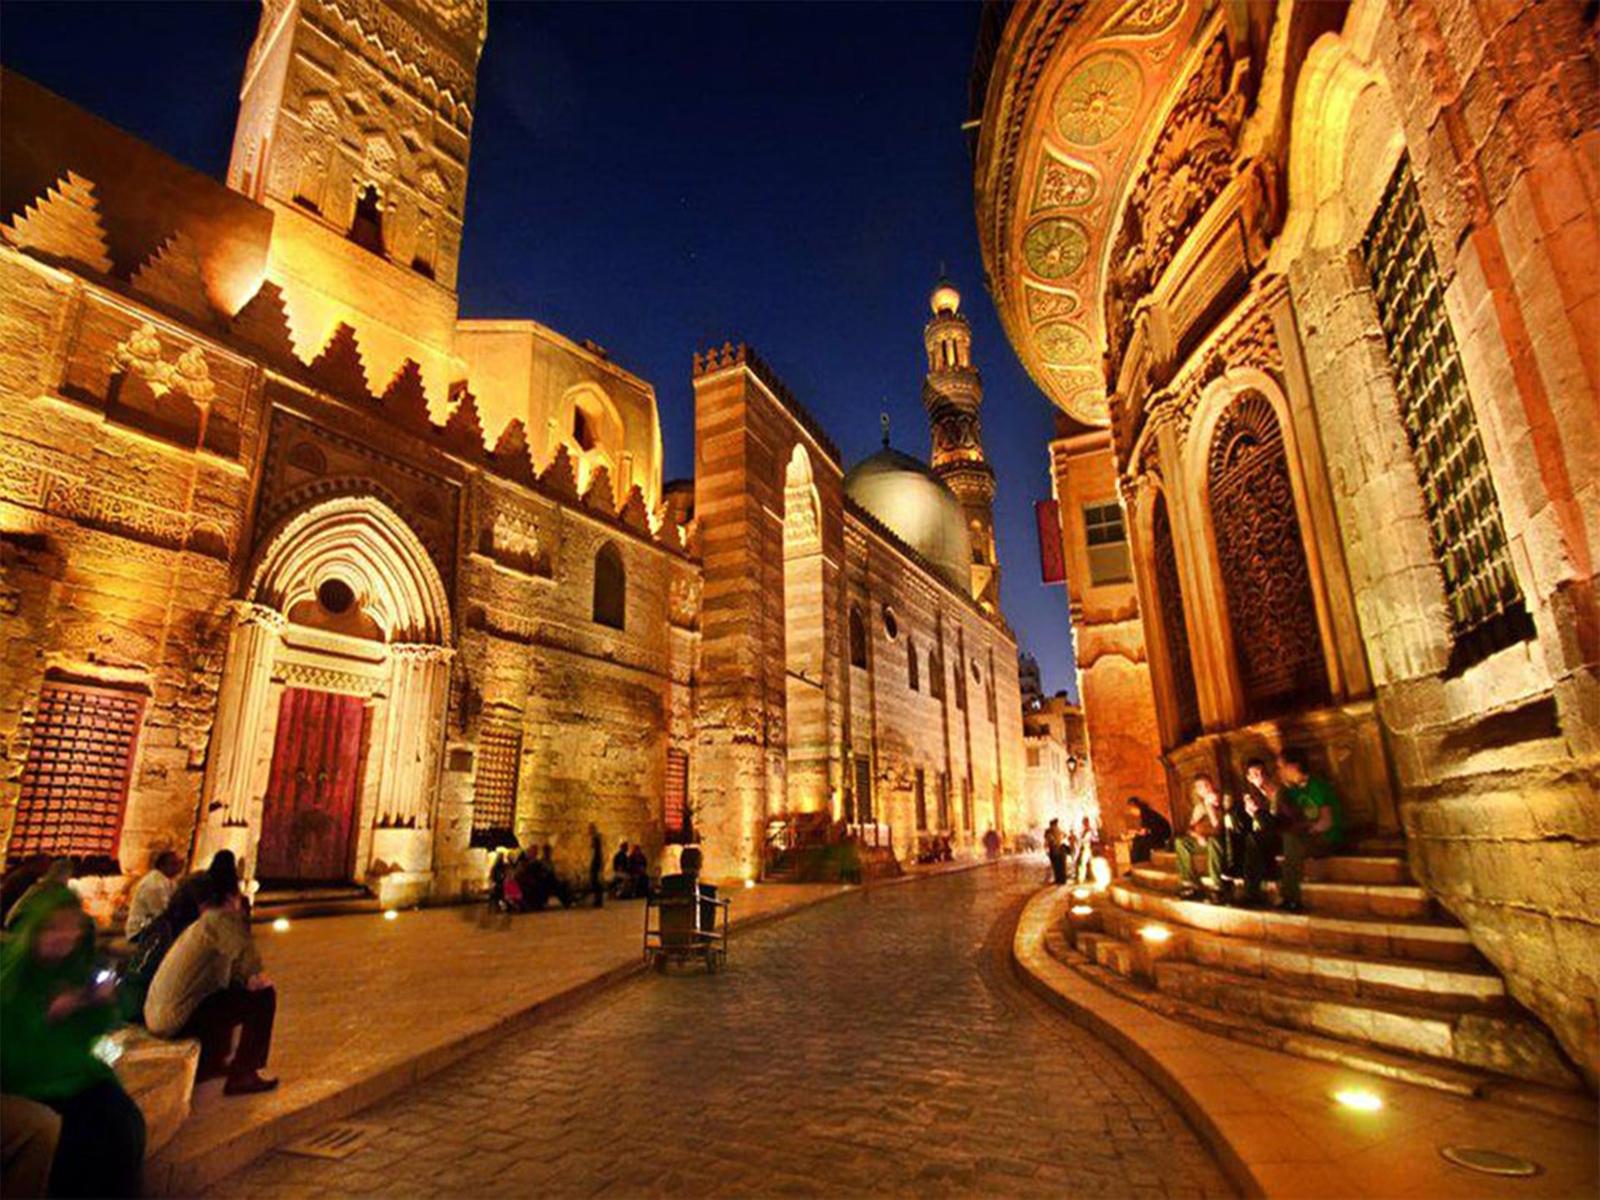 ac8a03fa4 السياحة في مصر | 15 من الاماكن السياحية في مصر - روائع السفر